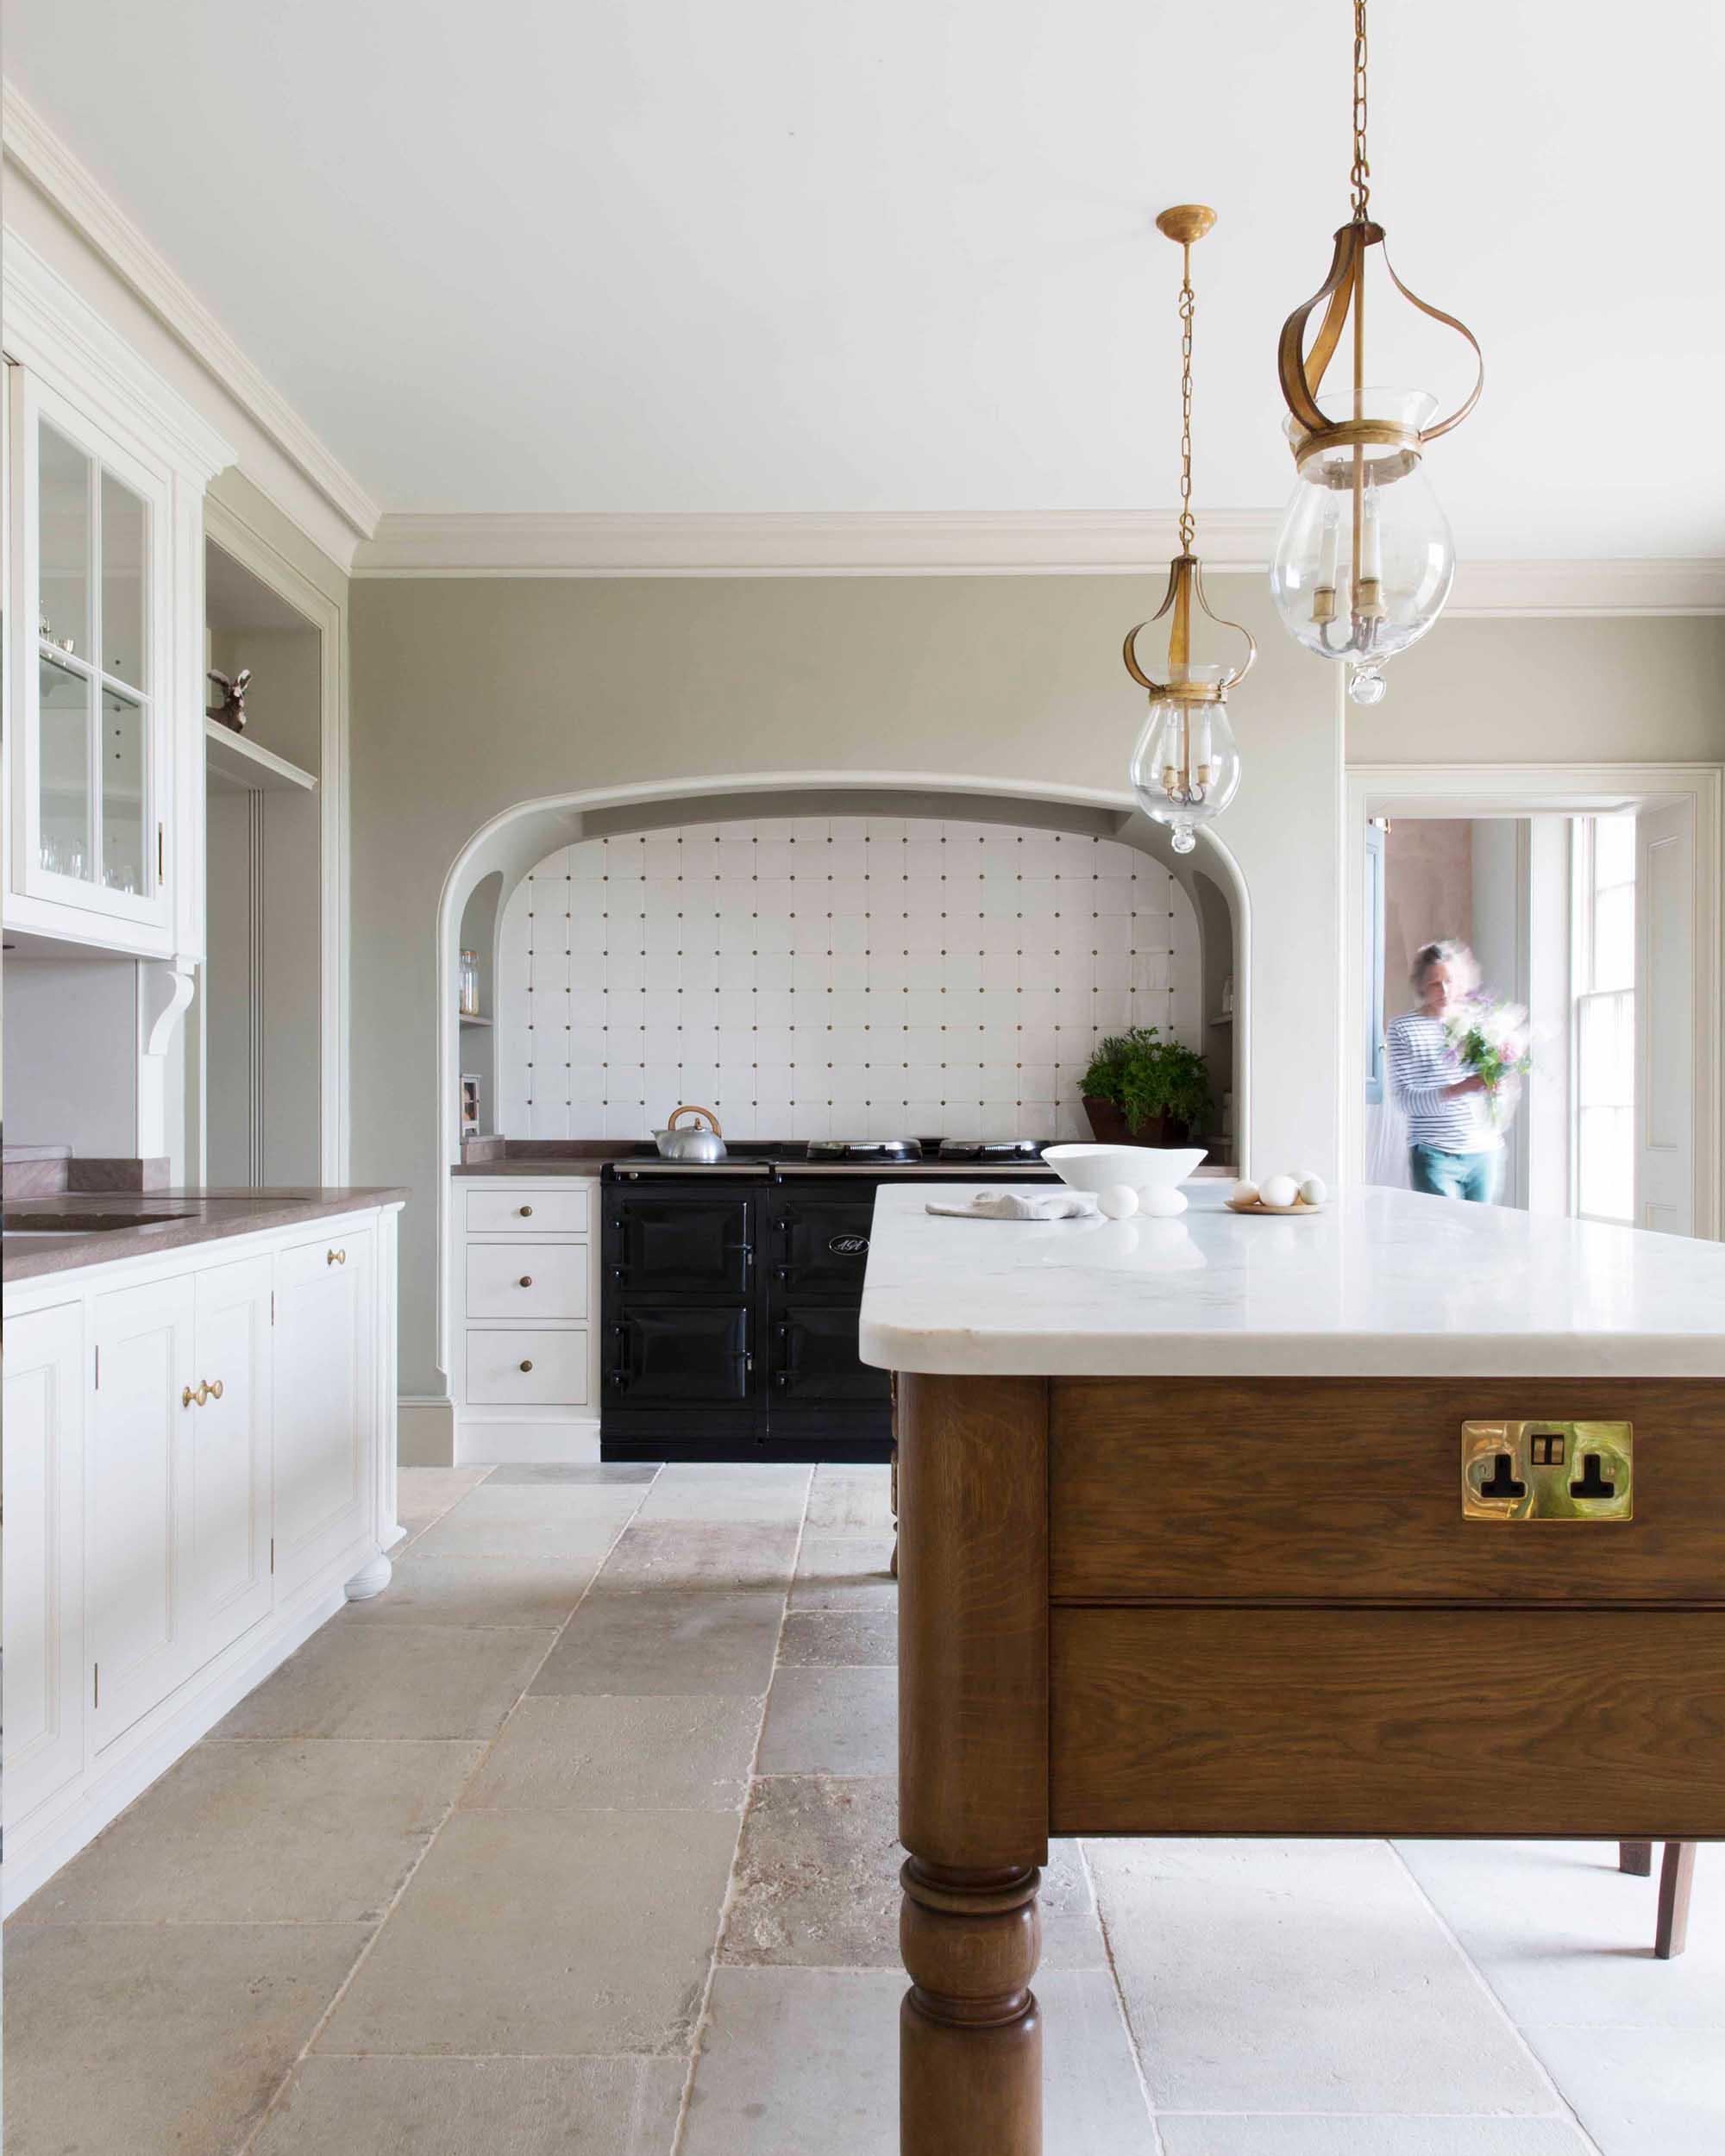 Bespoke Kitchen Designs: Bespoke Kitchens In Buckinghamshire